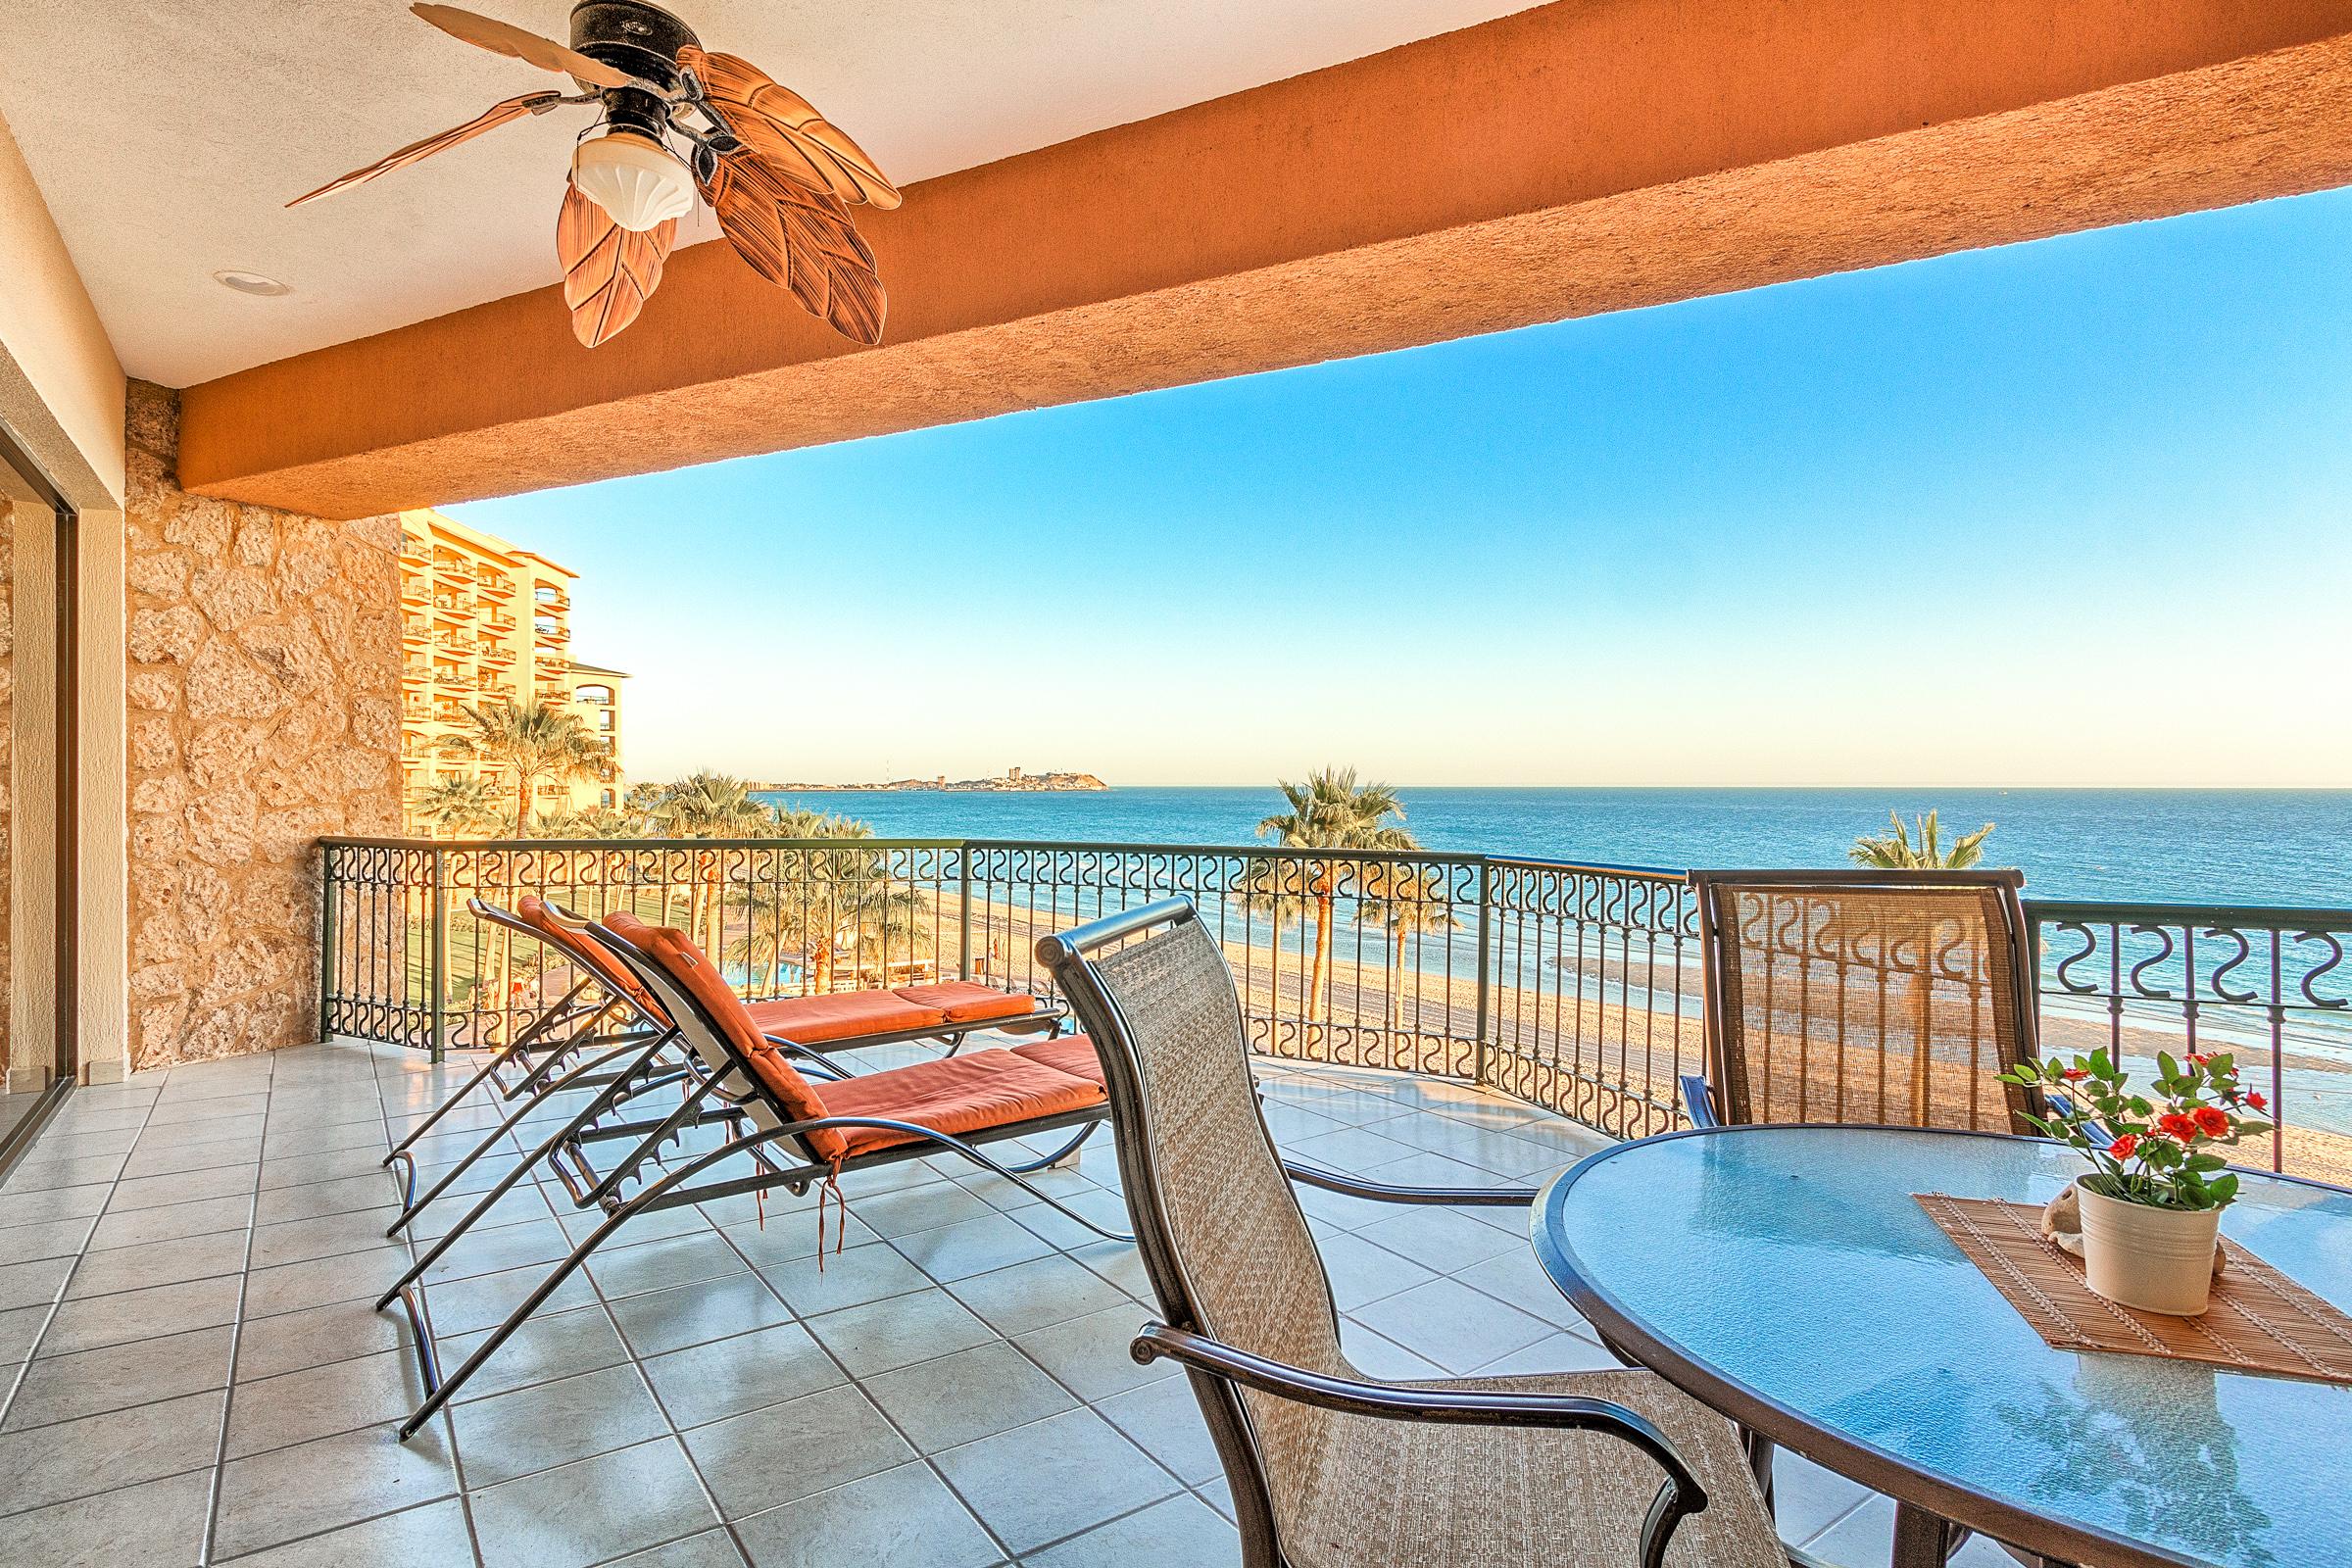 The Sonoran Resort